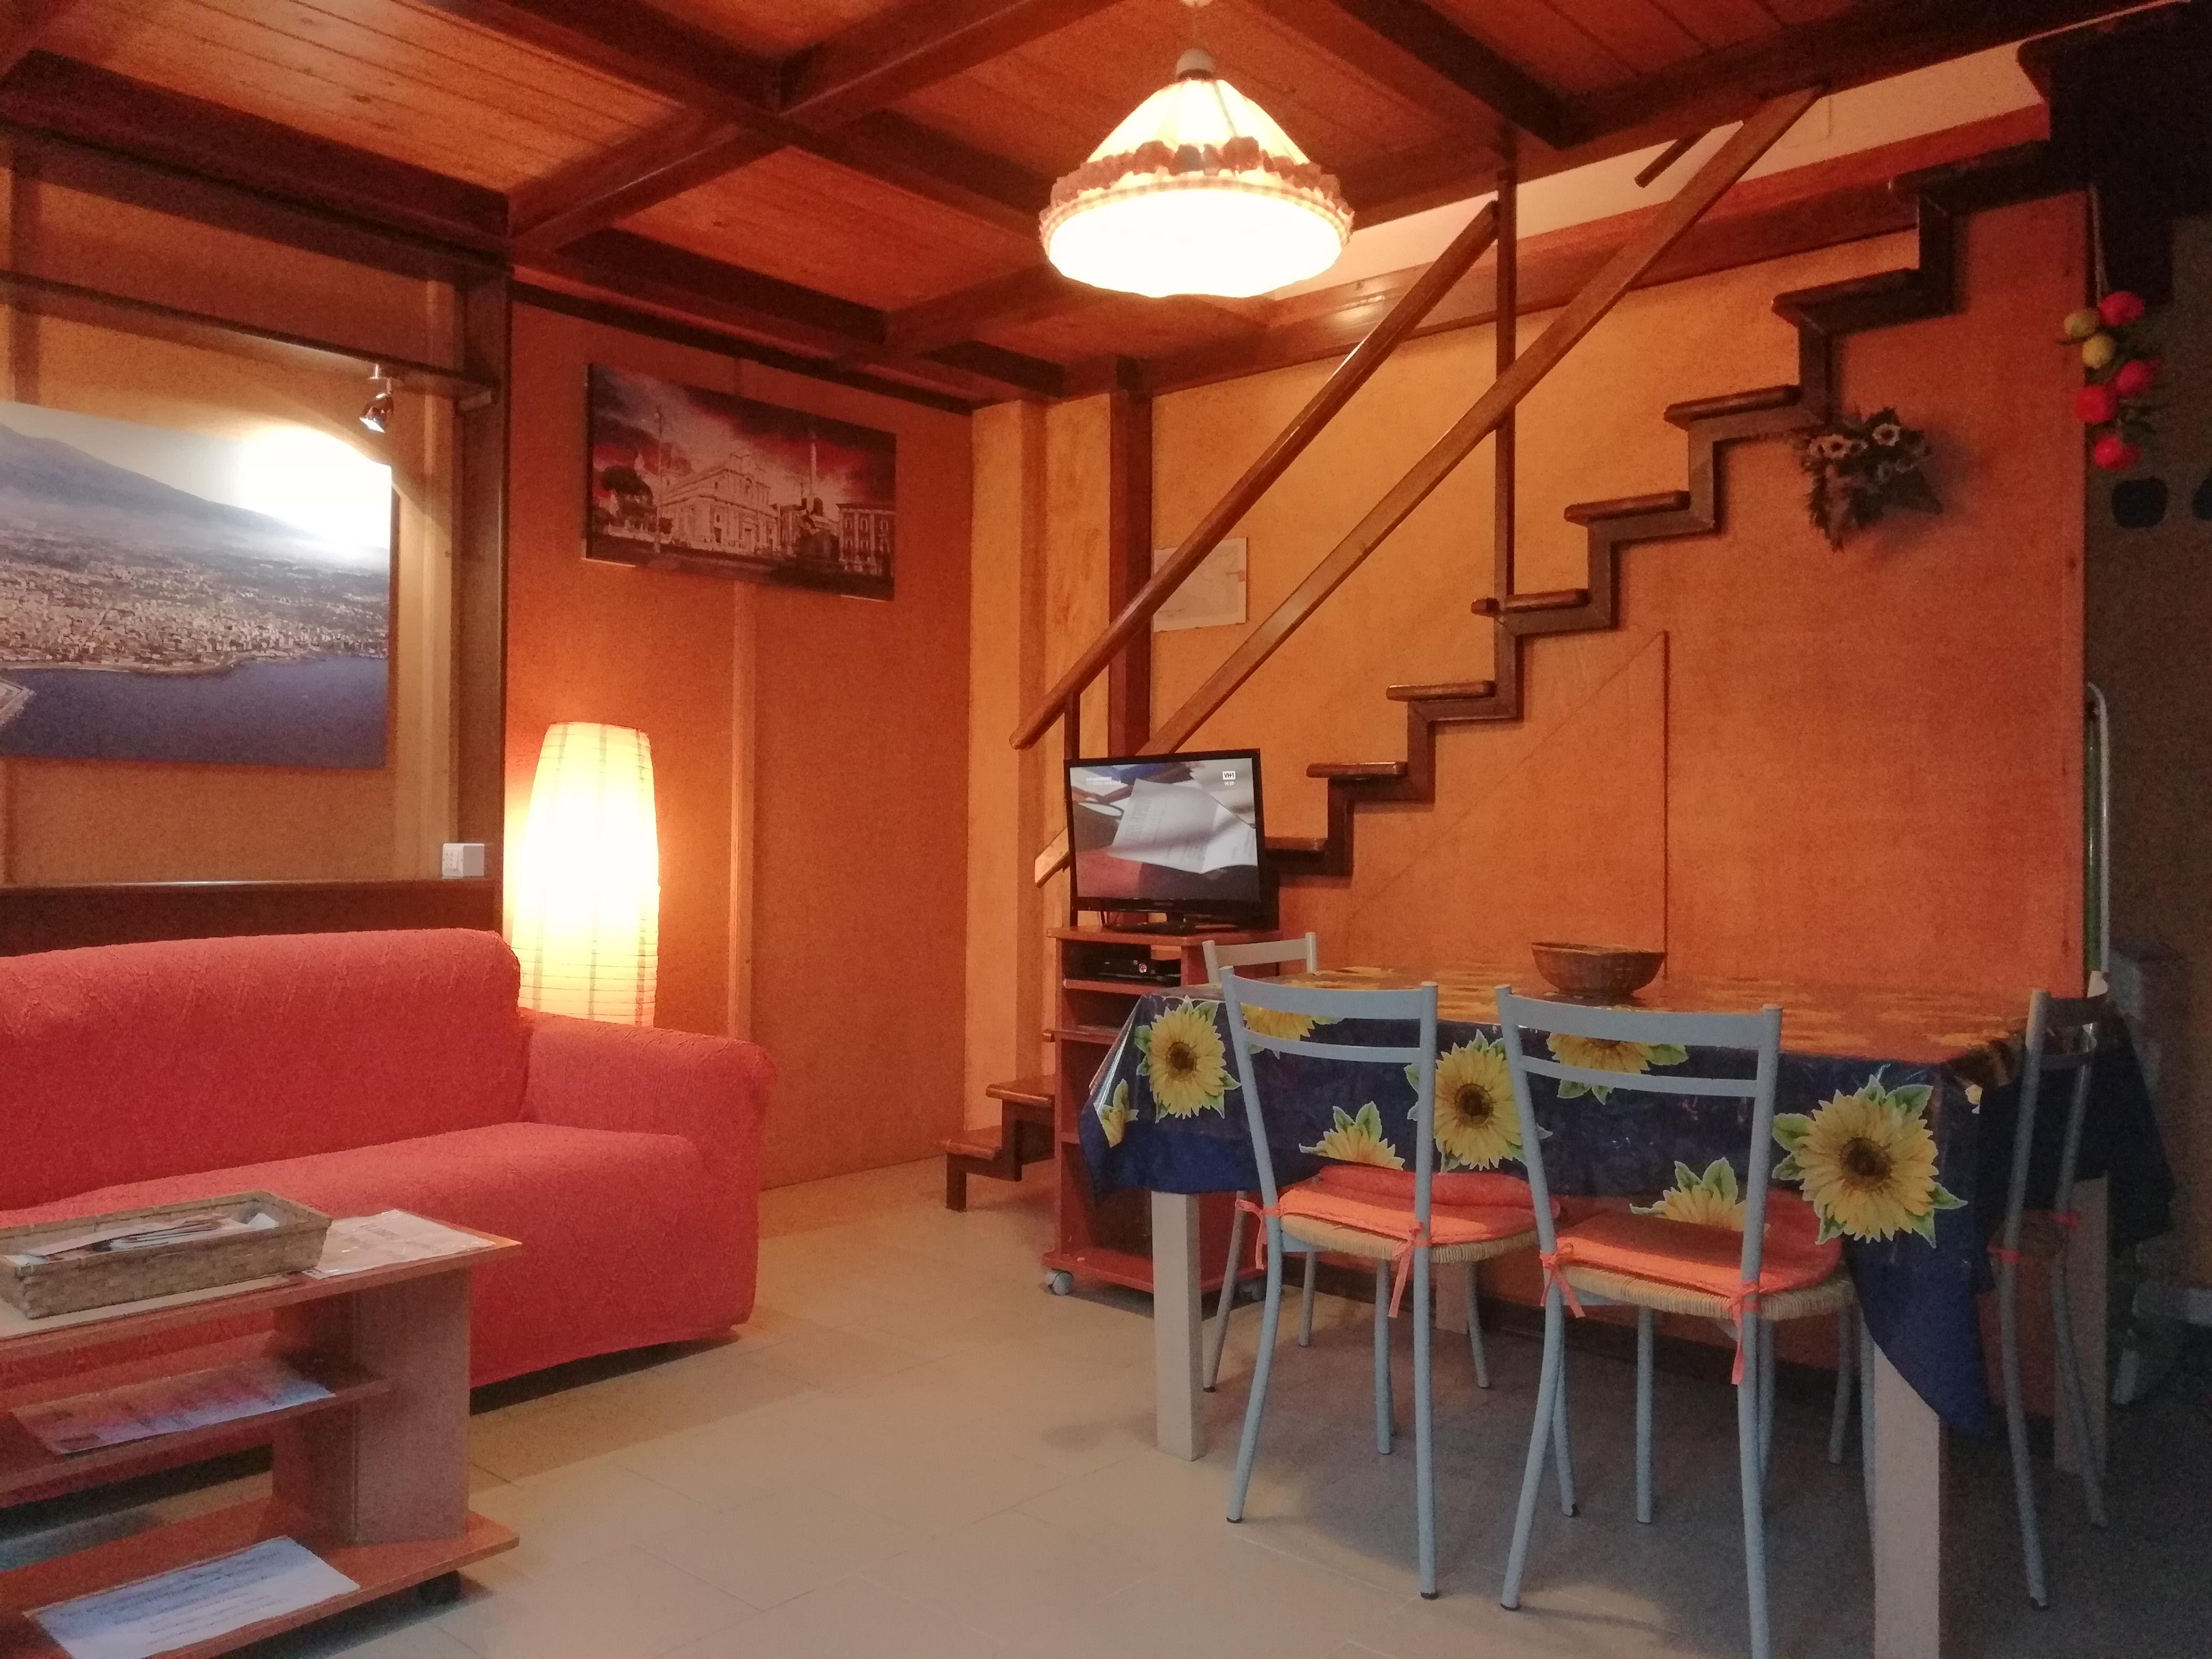 Ferienhaus Studio zwischen Etna und Taormina Mare schlieen (2379229), Santa Venerina, Catania, Sizilien, Italien, Bild 10